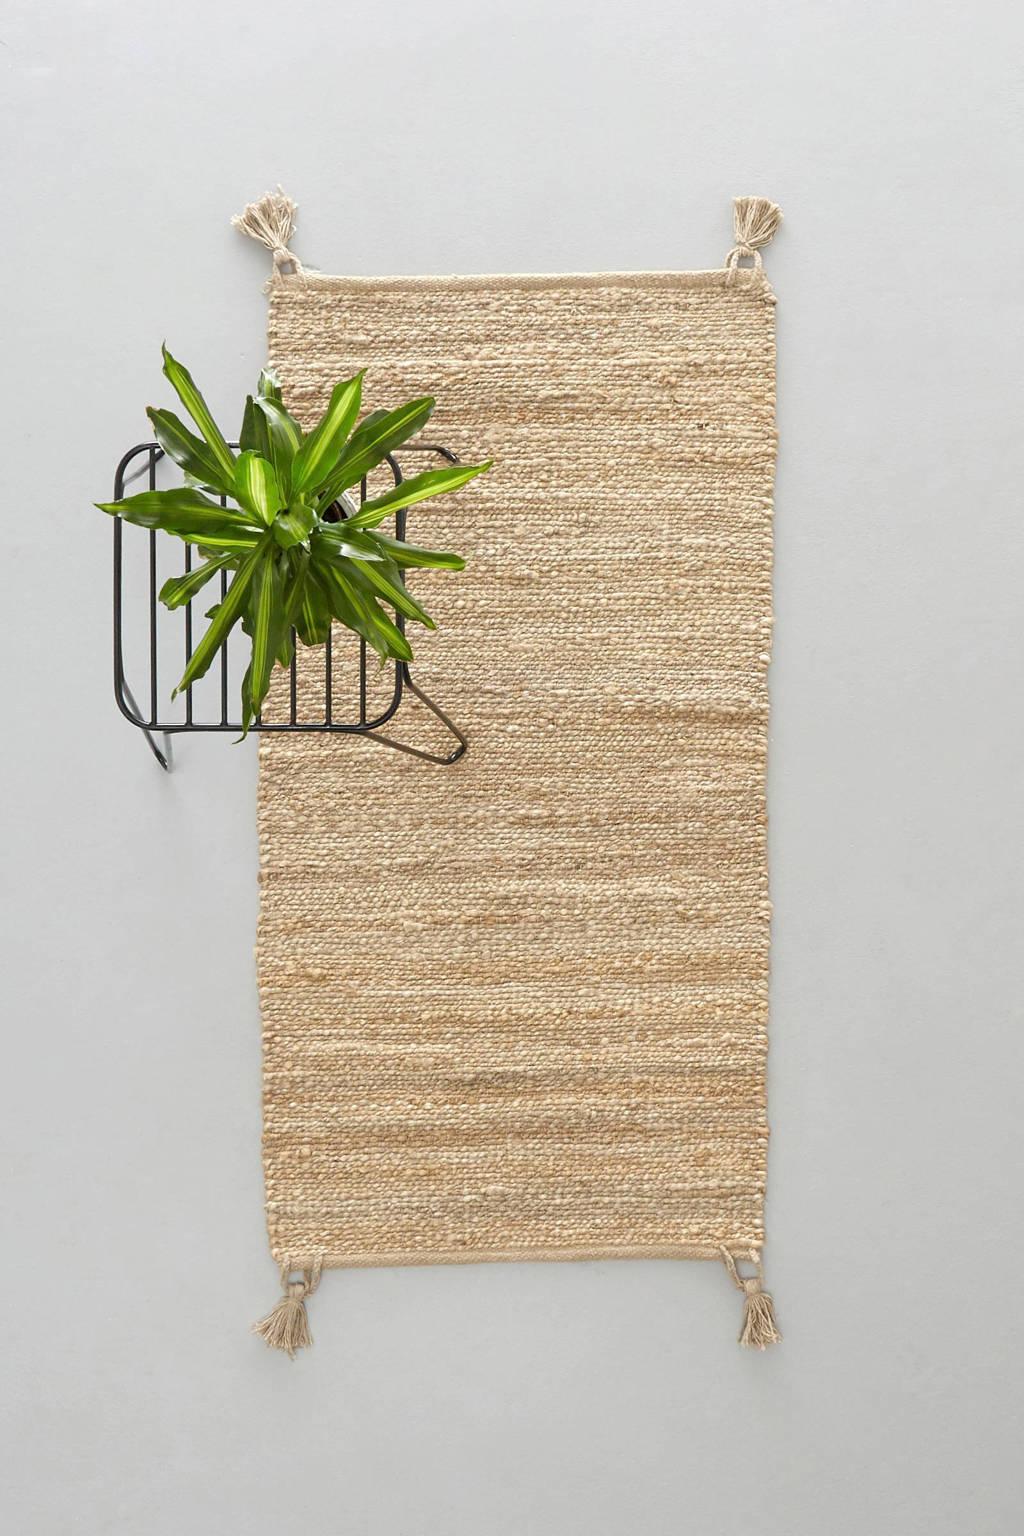 whkmp's own vloerkleed Savi  (120x60 cm), Naturel